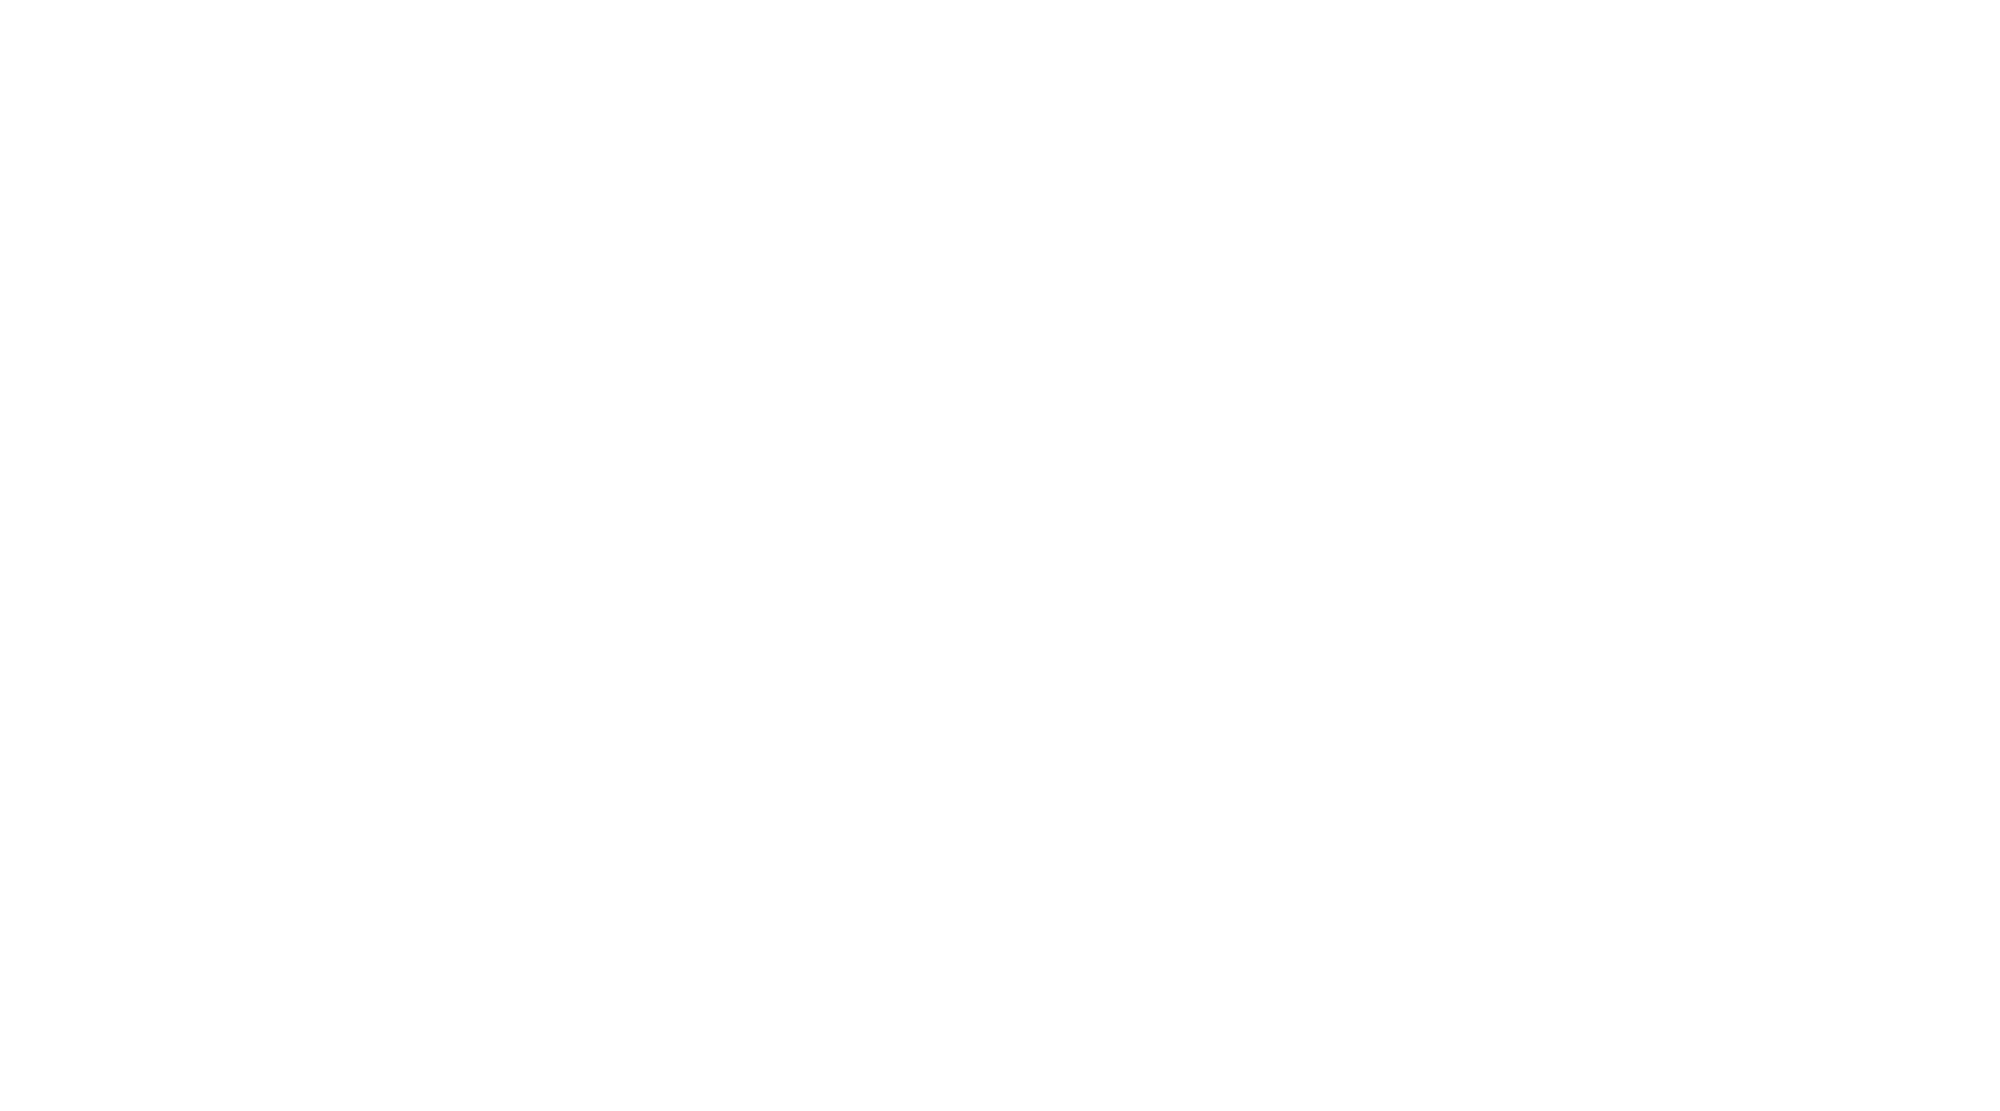 Amc Media Png Logo 4588